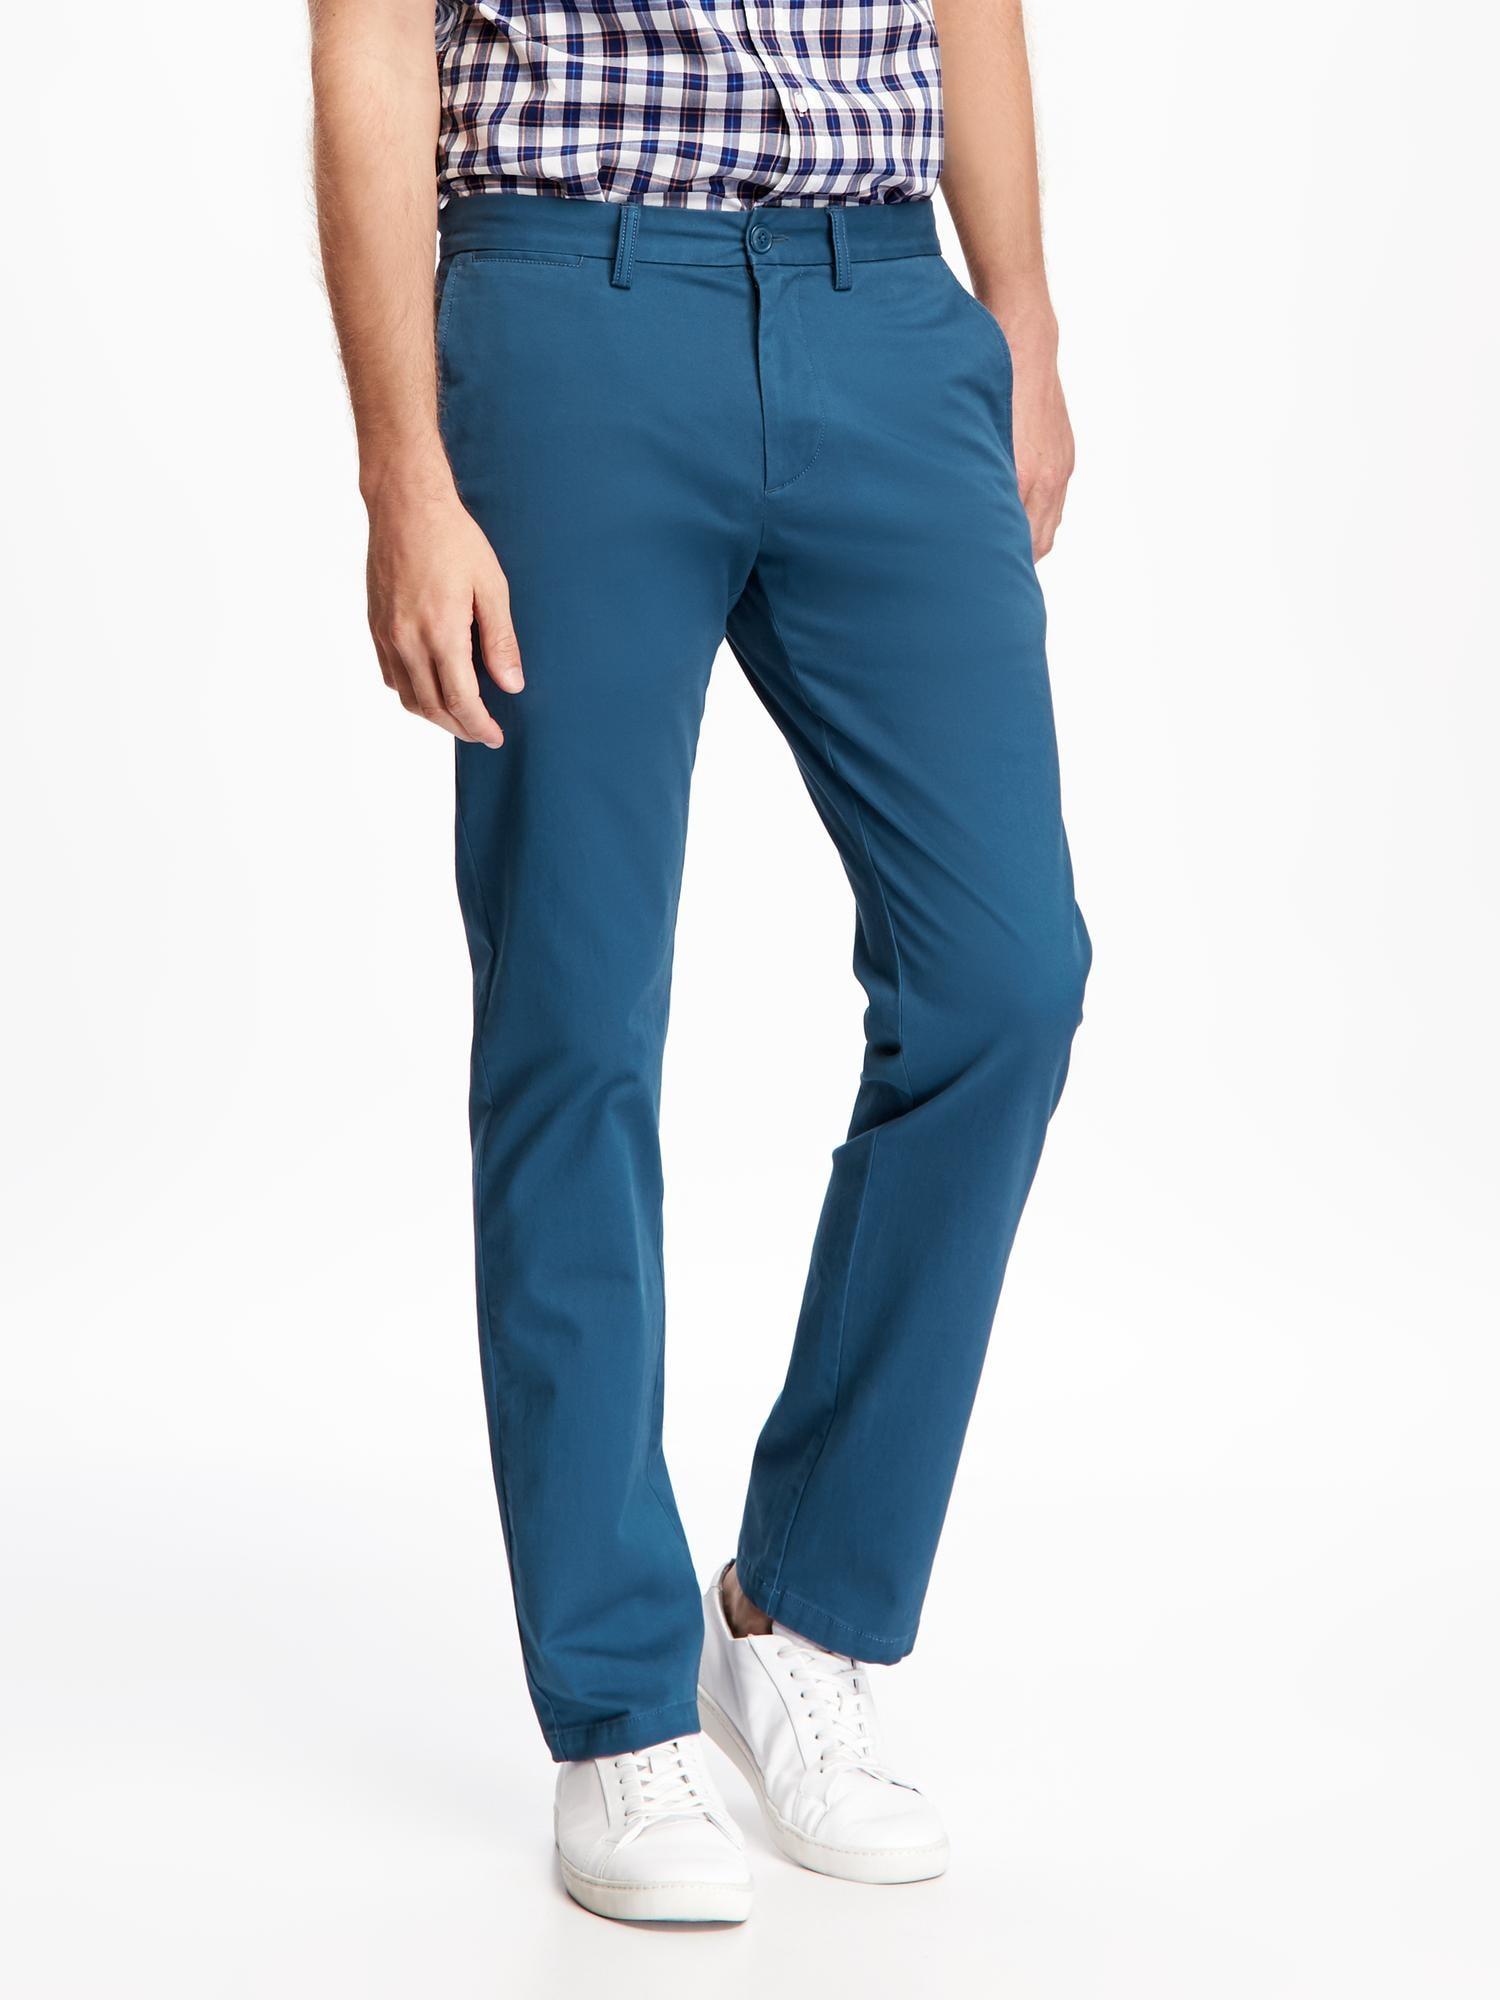 3aeadee62 Slim Ultimate Built-In Flex Khakis for Men